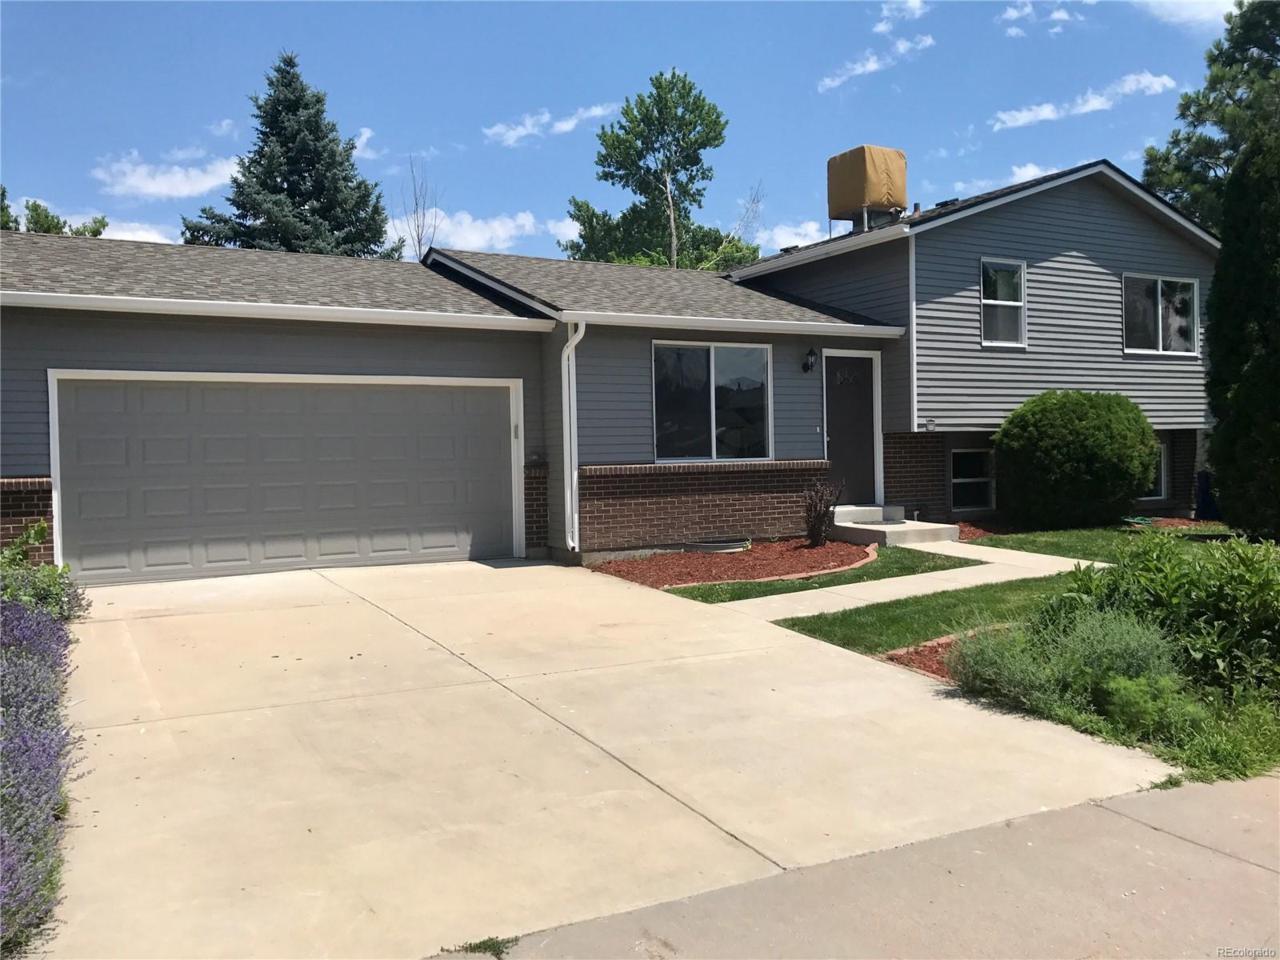 4366 S Coors Street, Morrison, CO 80465 (MLS #3687820) :: 8z Real Estate